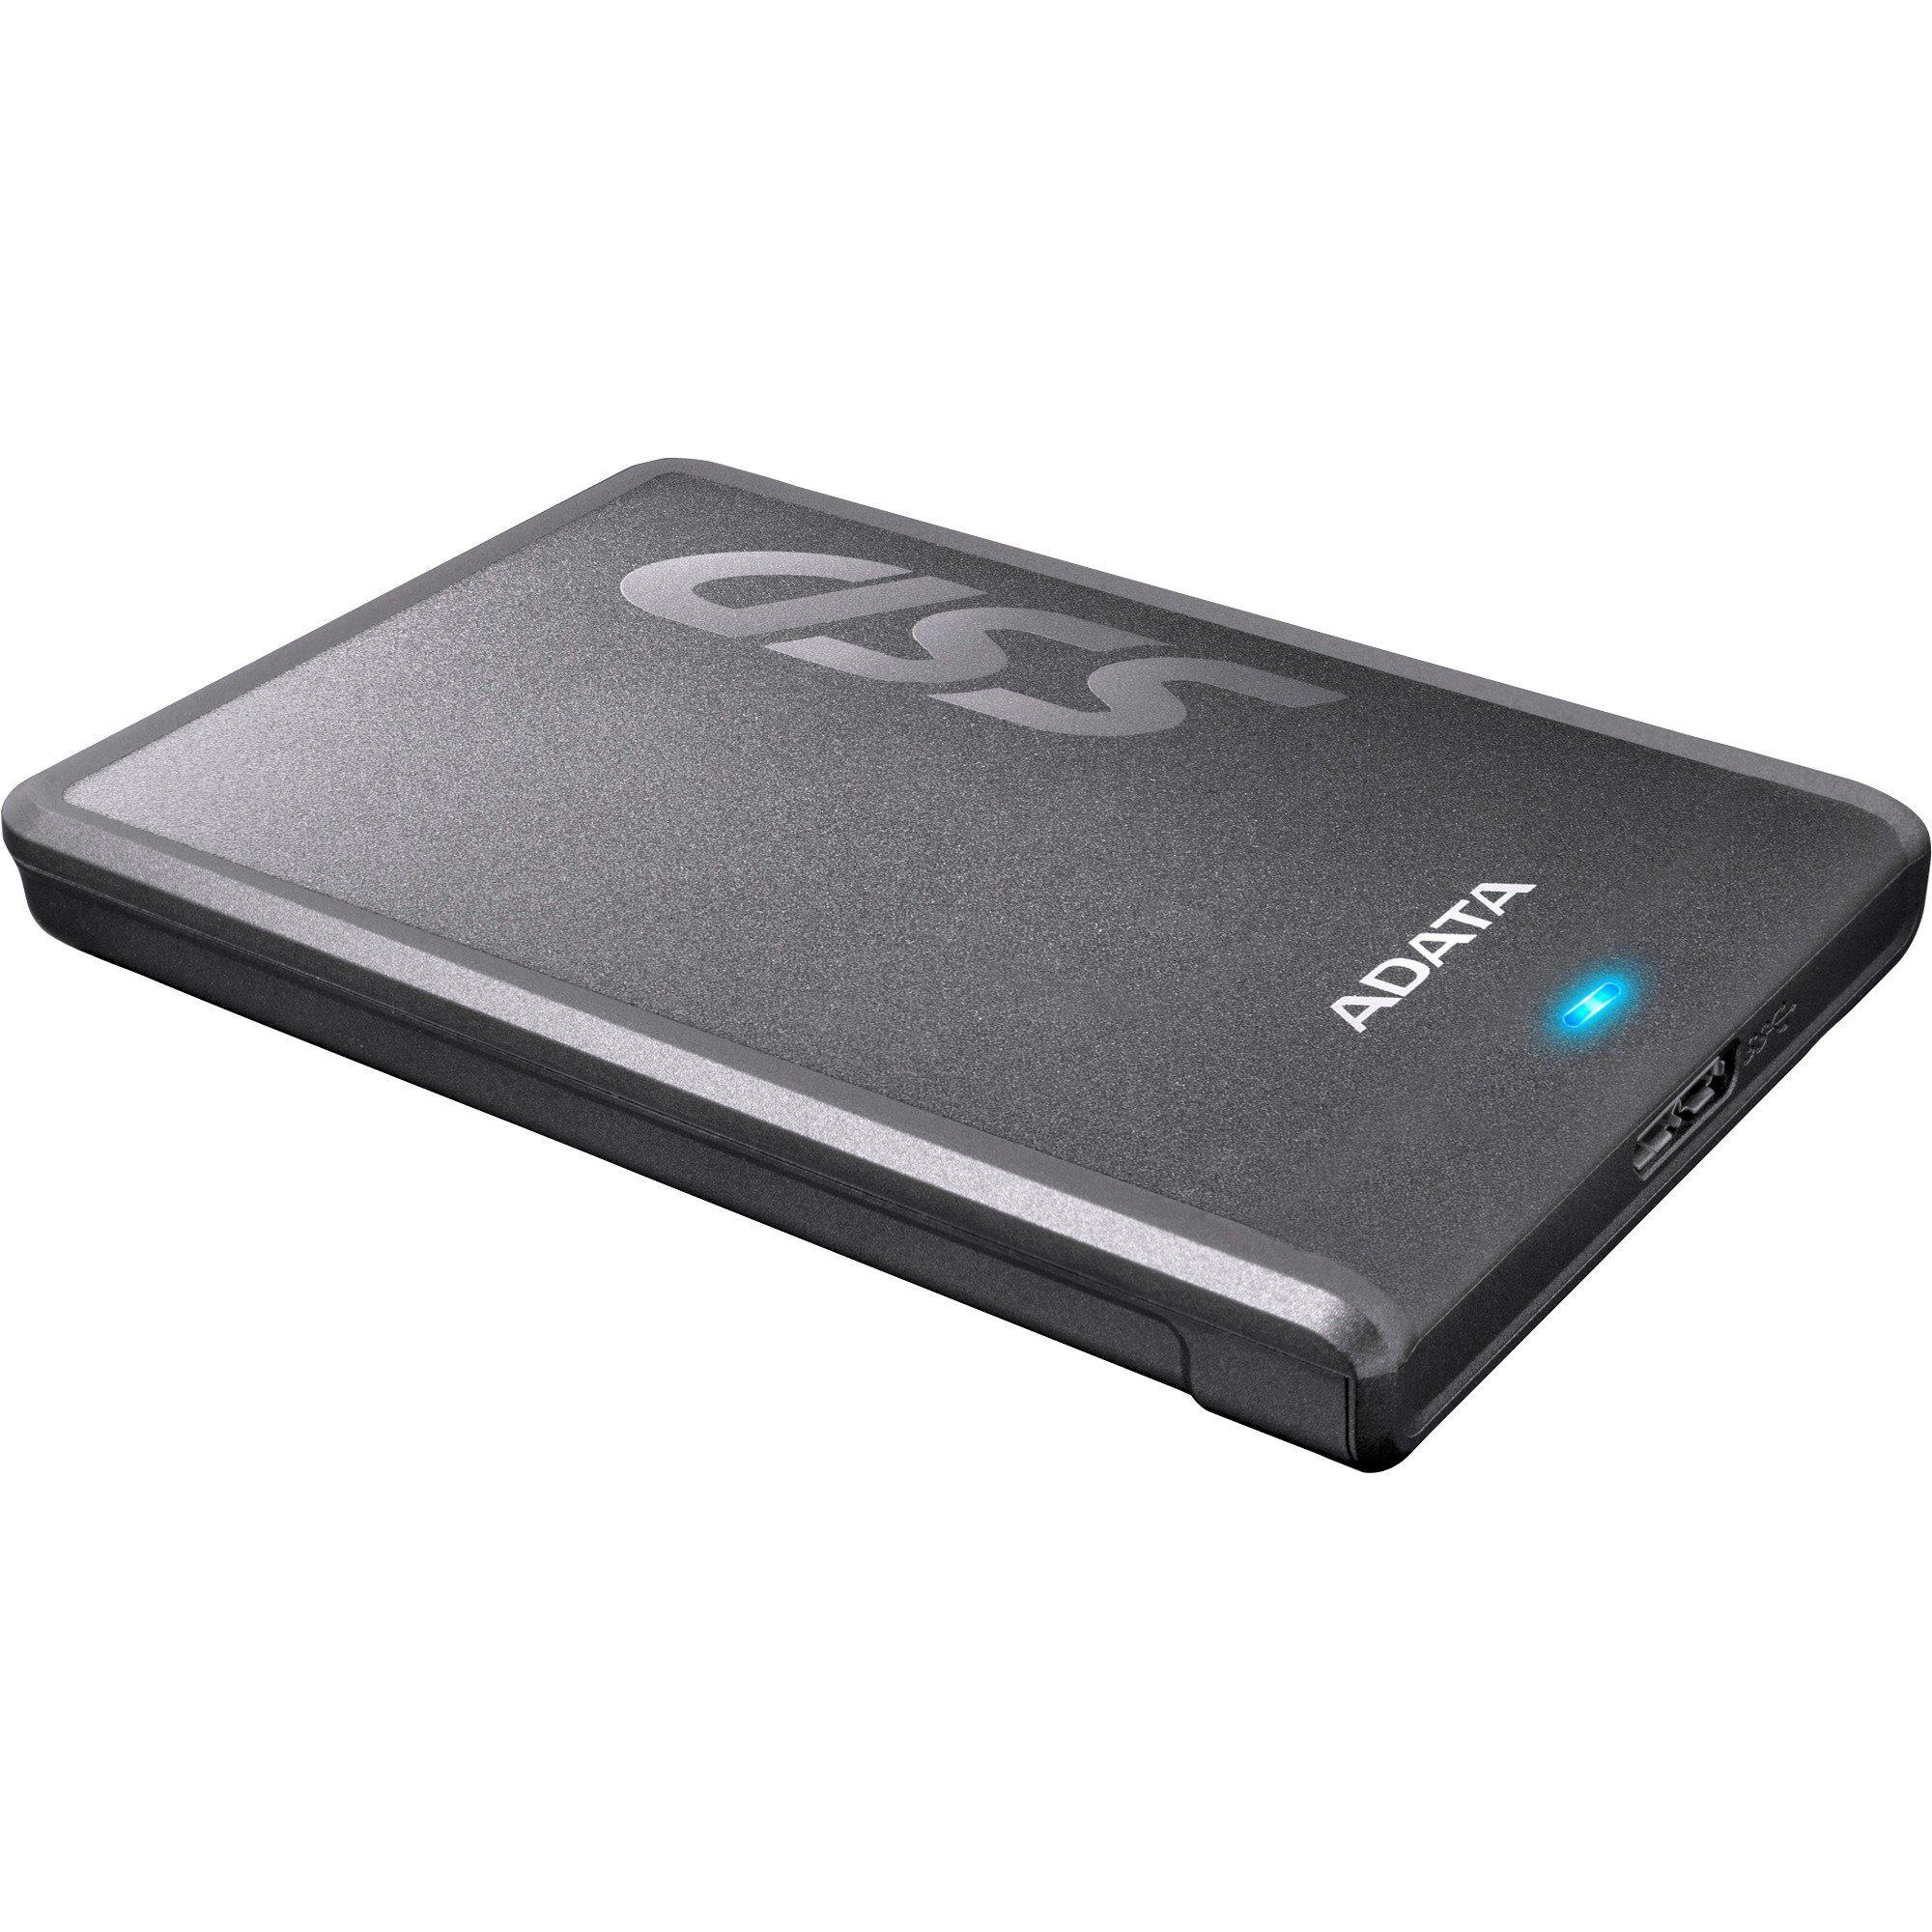 ADATA Solid State Drive »SV620 480 GB«